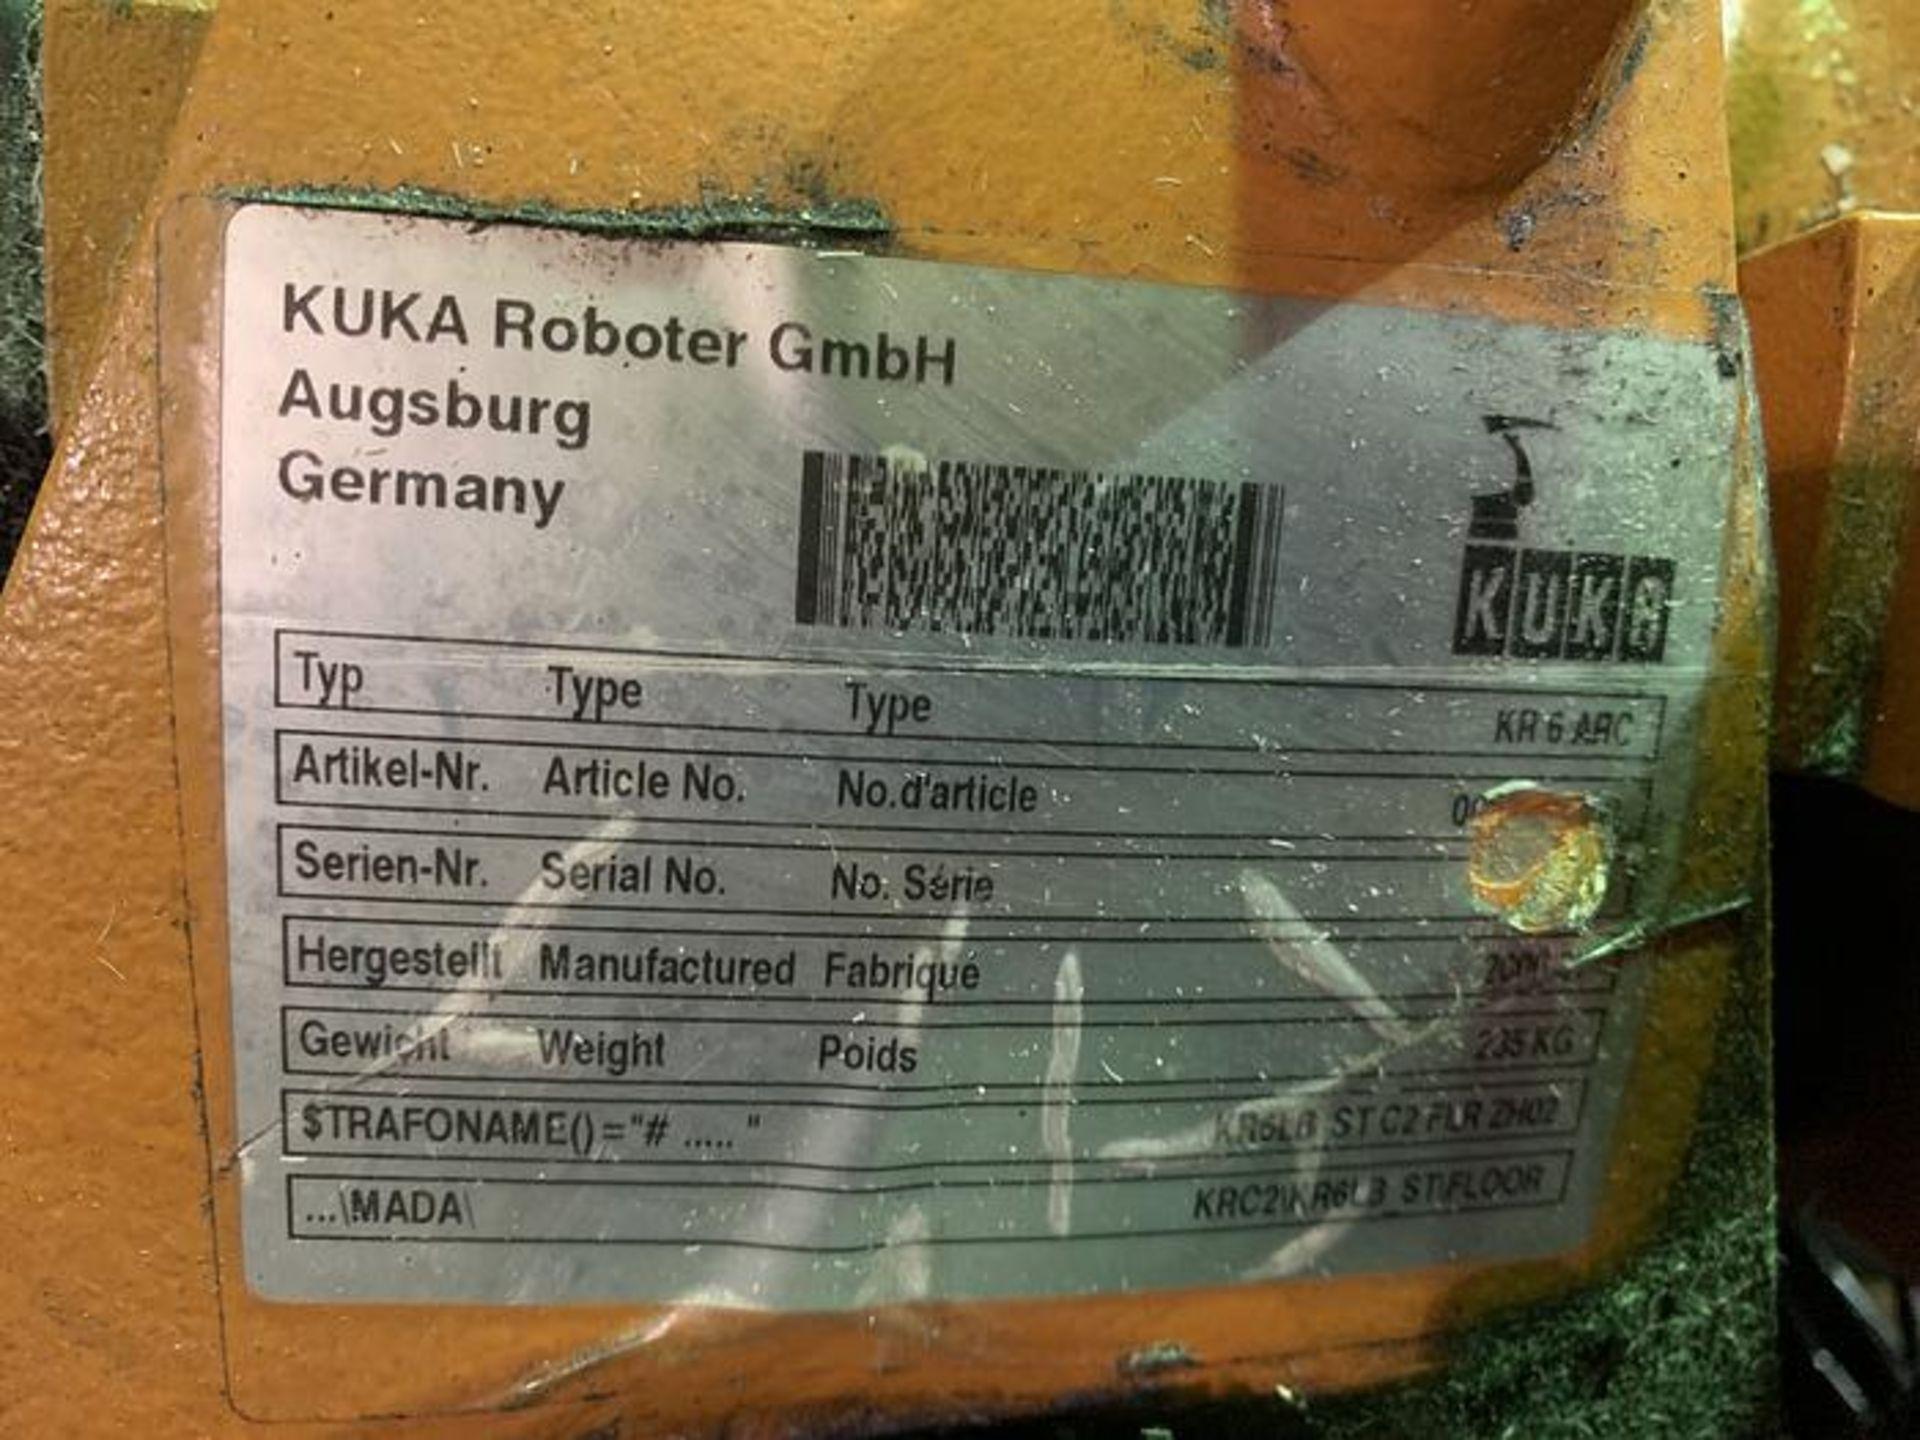 Lot 62 - KUKA KR6 ARC 6 AXIS CNC ROBOT 6KG X 1611MM W/KRC2 ed05 CONTROL, YEAR 2006, SN 880293/45203